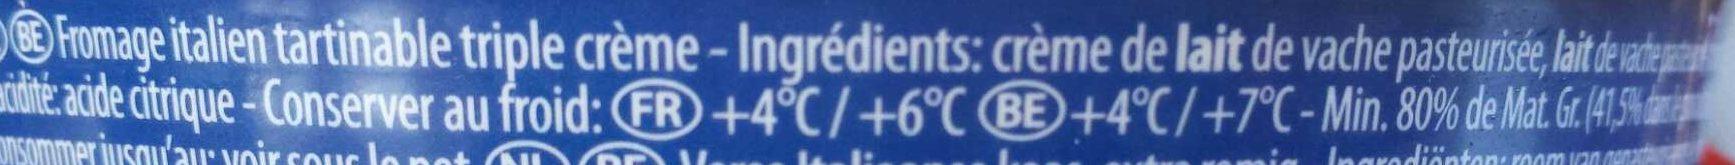 Mascarpone - Ingredients - fr